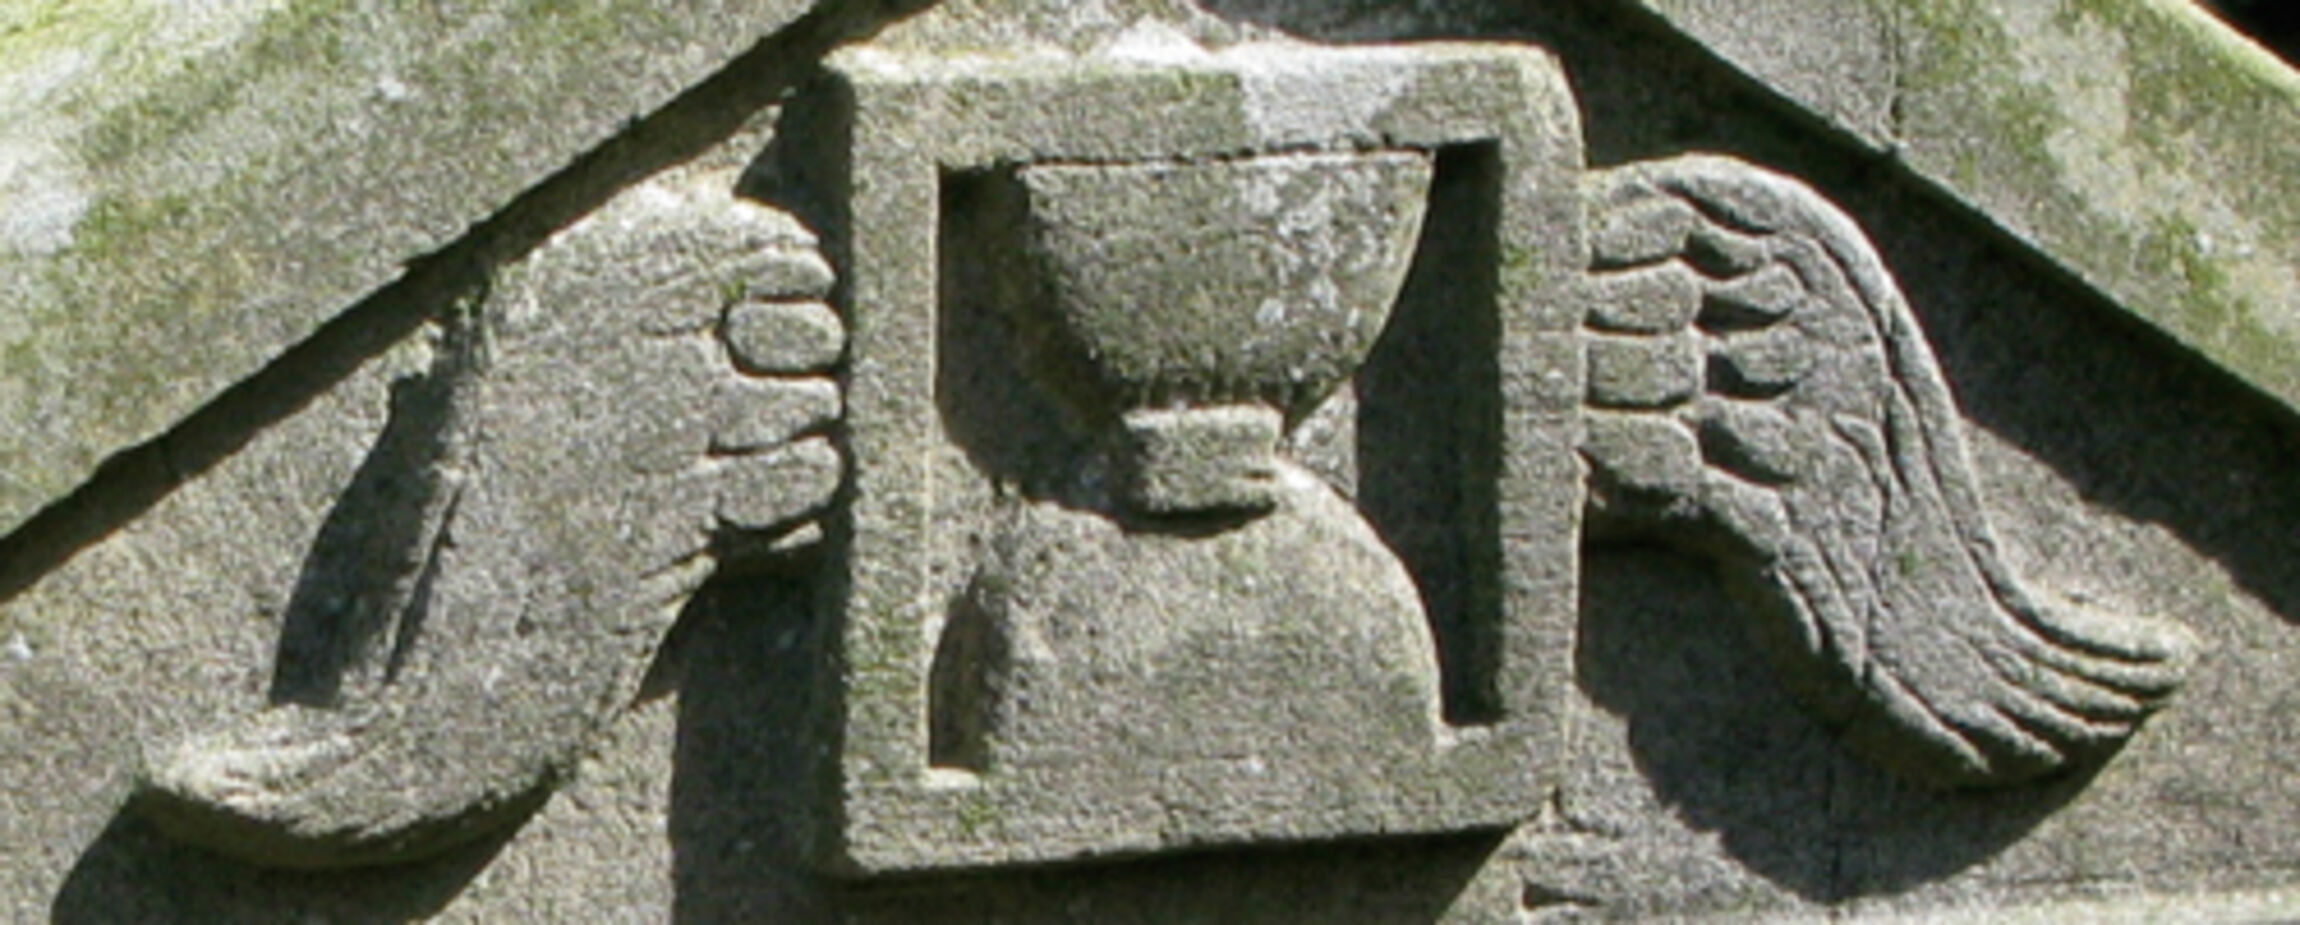 horstfriedhof_02